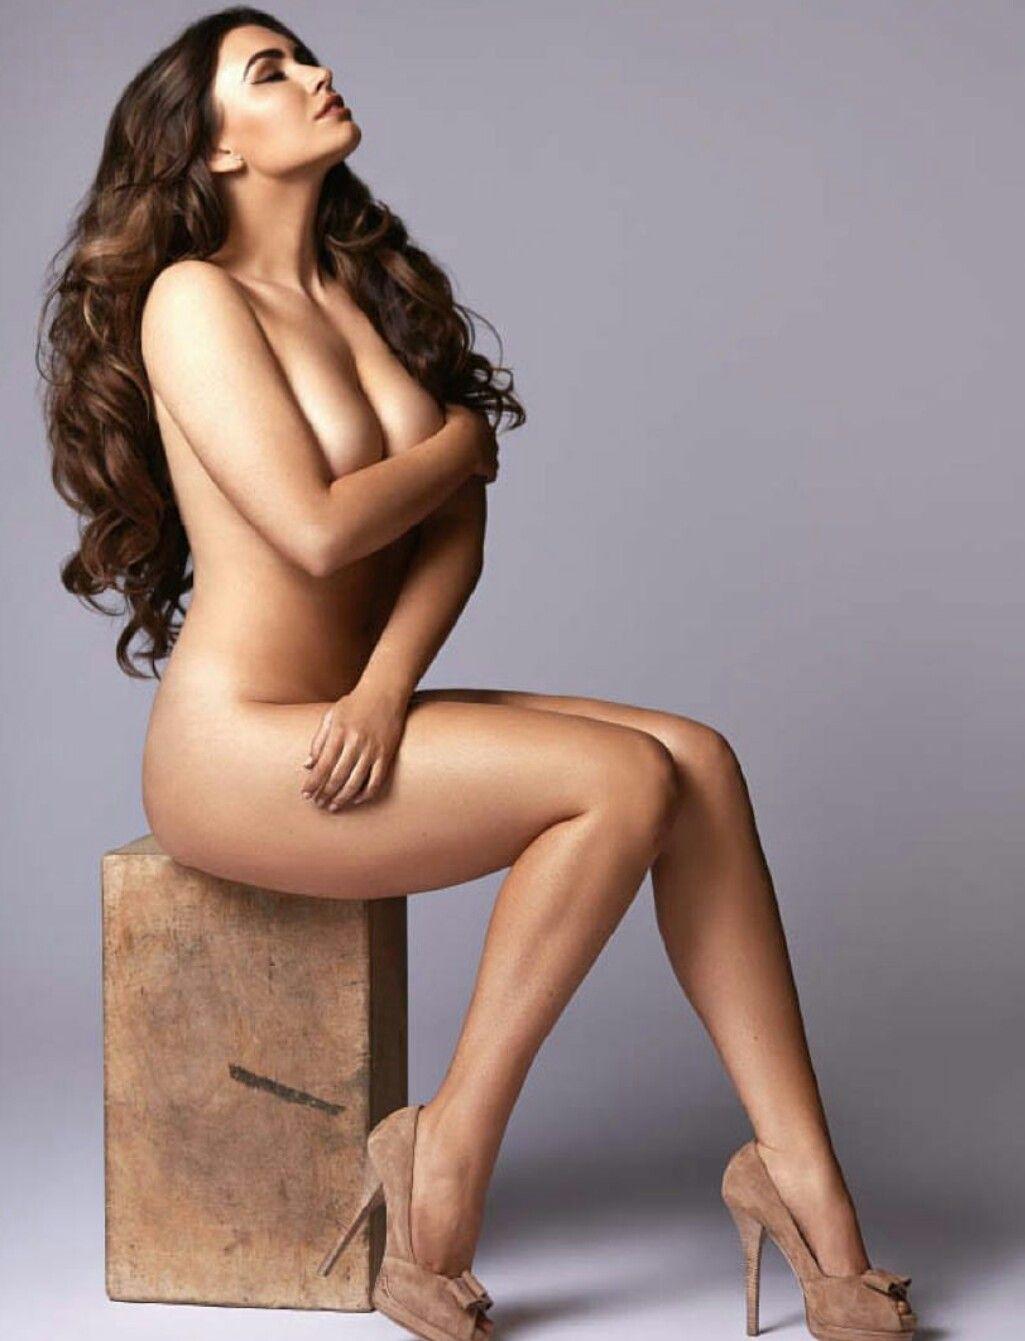 Latina pussy sexy shaved